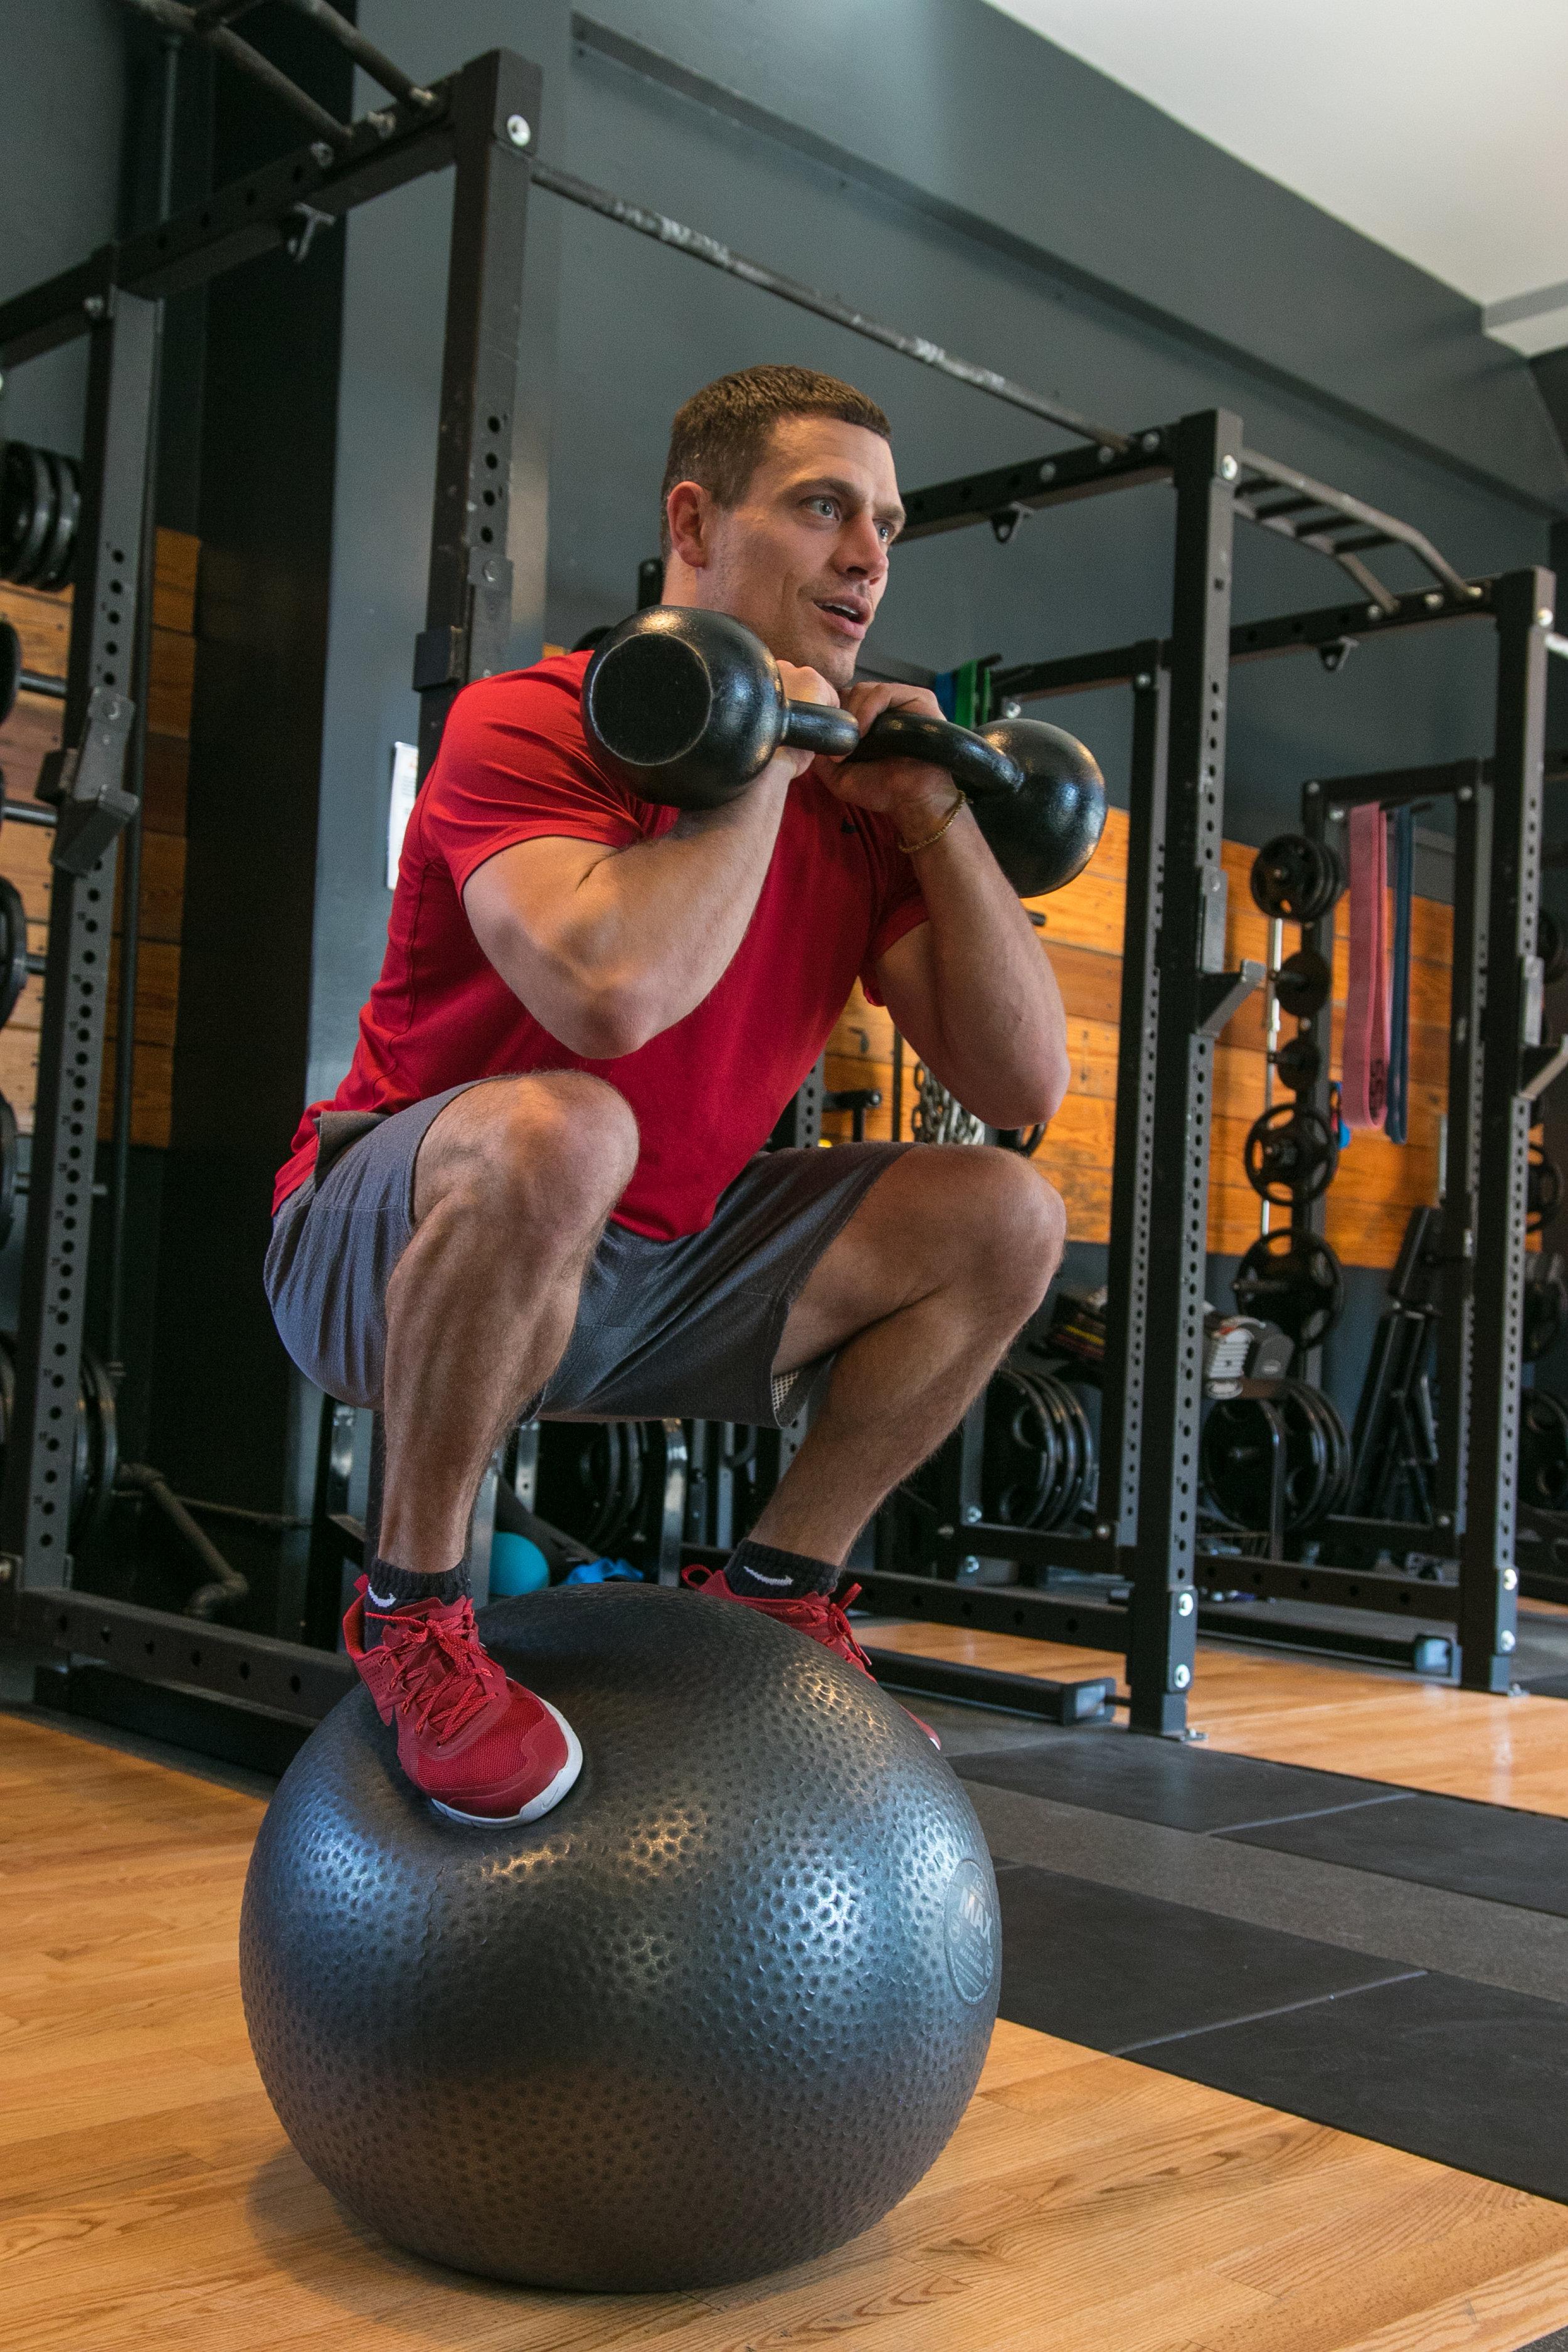 Tycho Bergquist stability ball kettle bell squat NASM ACSM.jpg